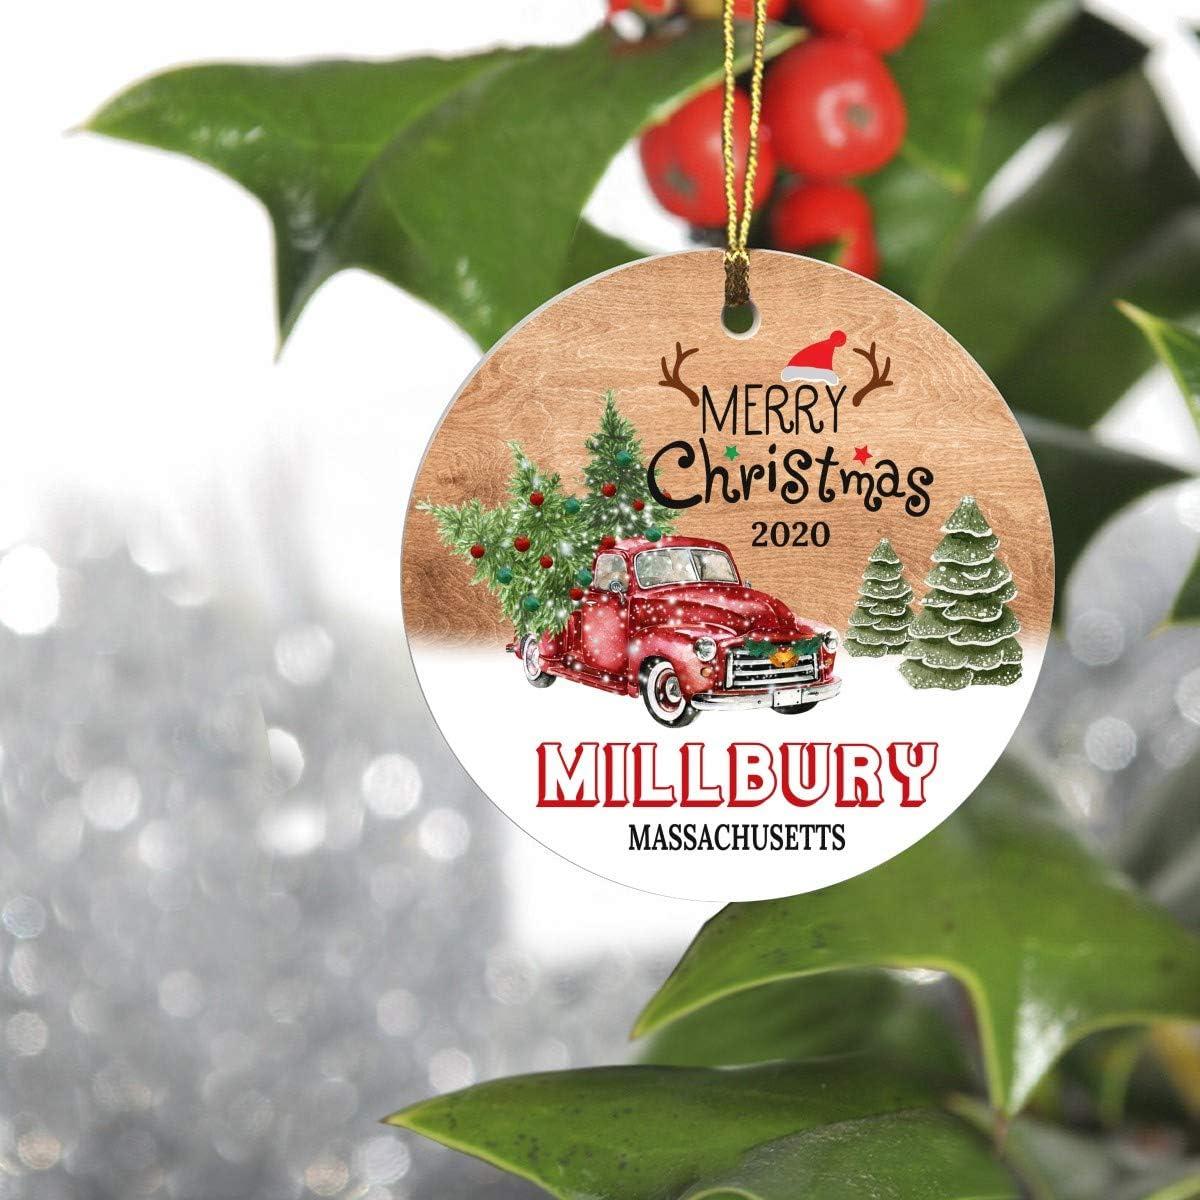 Merry Christmas Tree Decorations Ornaments 2020 - Ornament Hometown Millbury Massachusetts MA State - Keepsake Gift Ideas Ornament 3